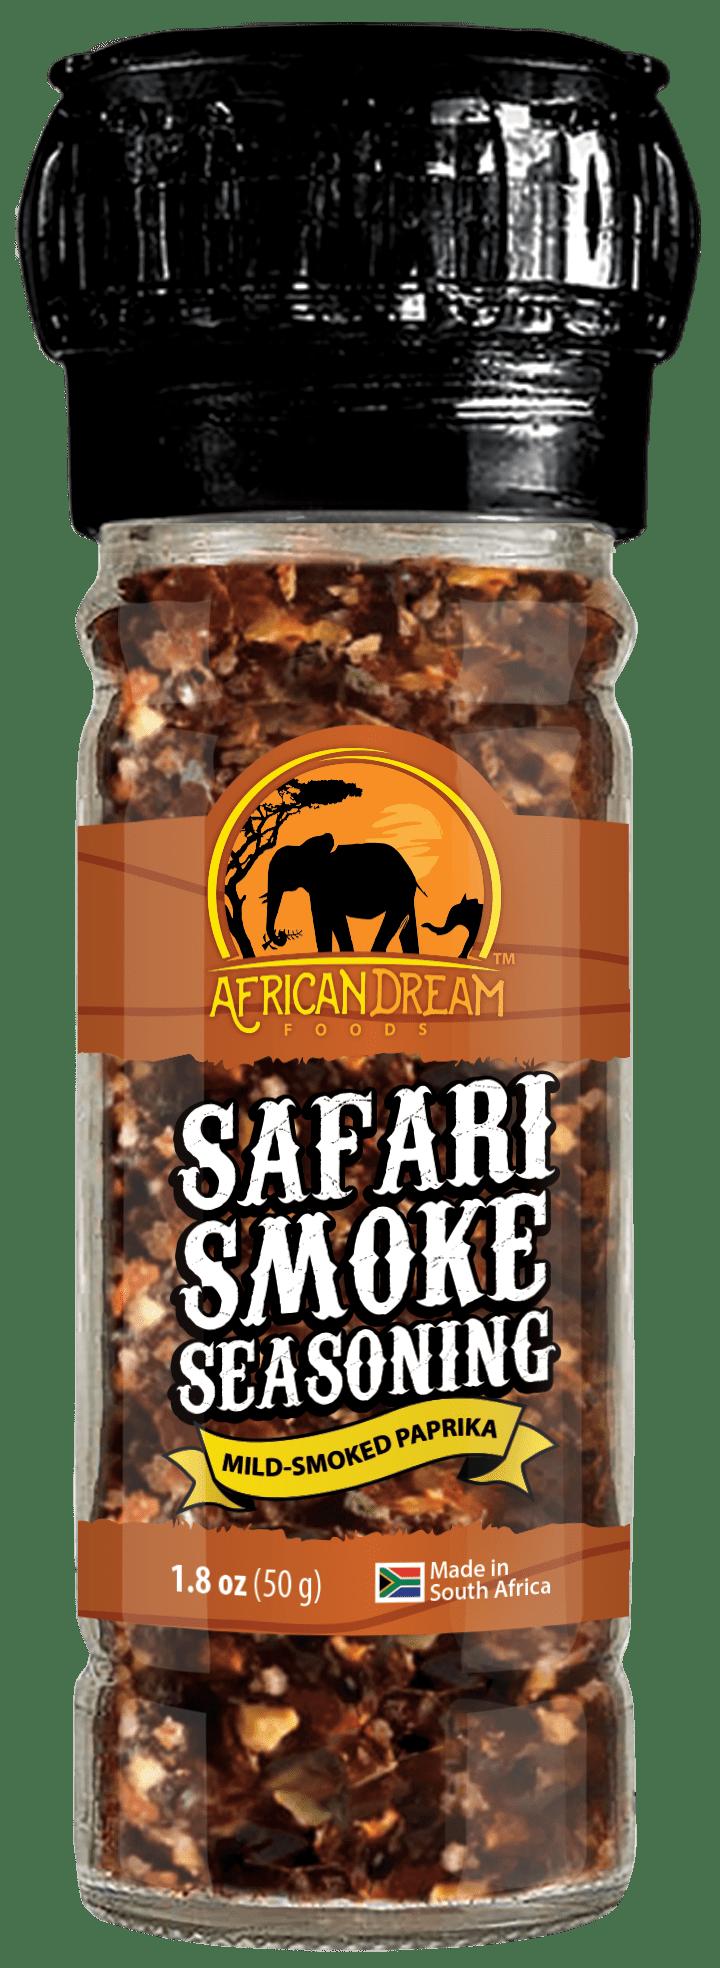 Safari Smoke Seasoning